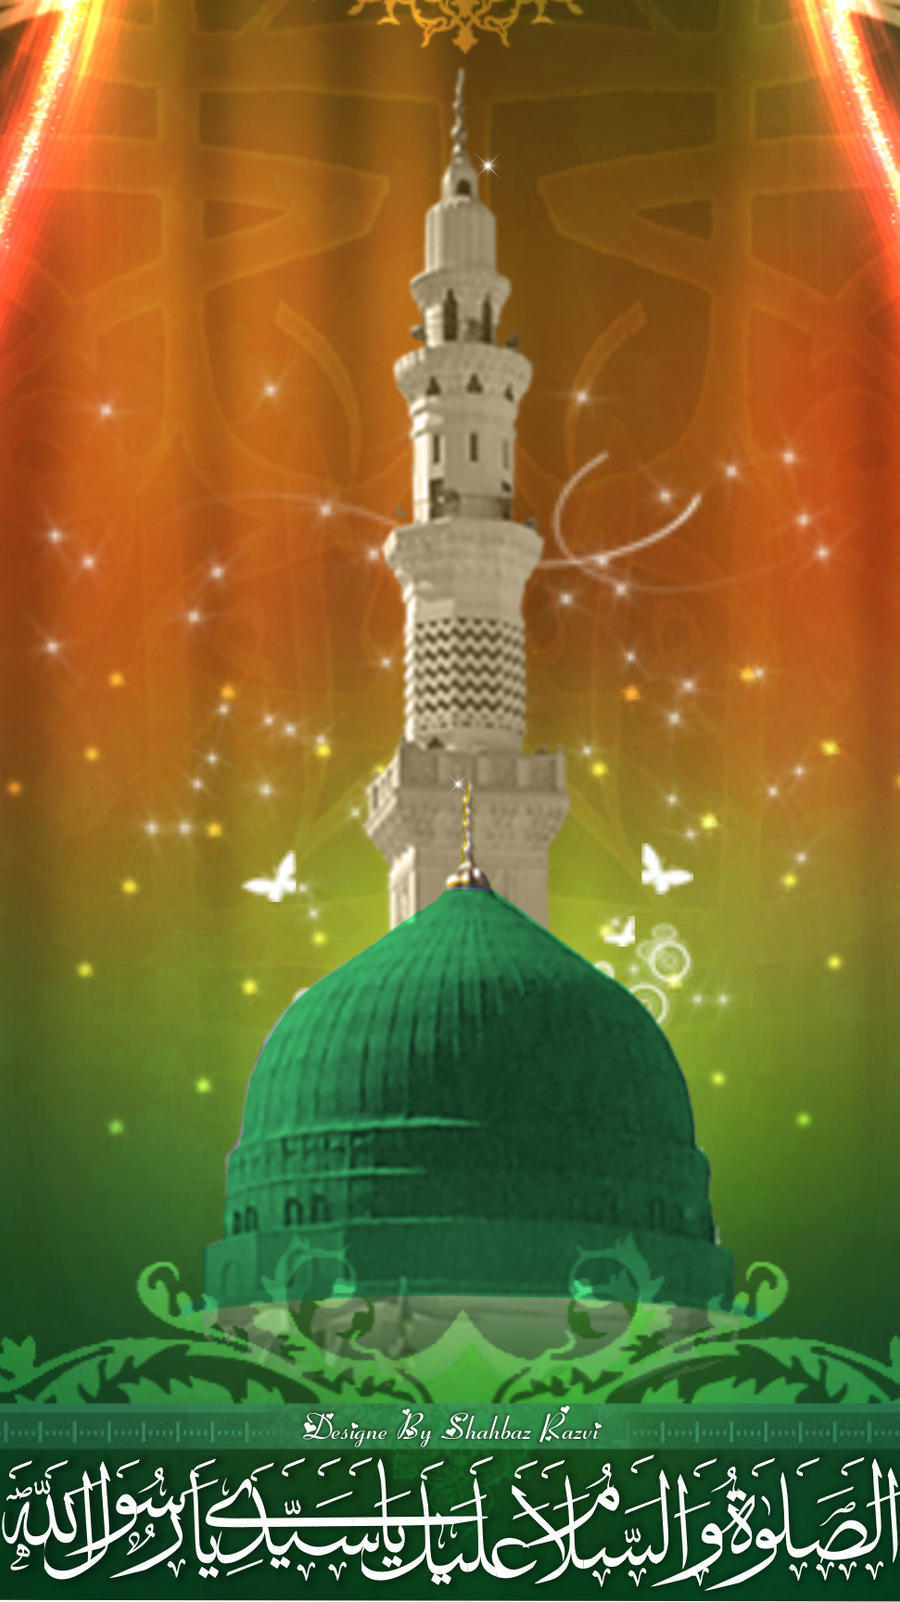 Islamic Wallpaper Hd By Shahbazrazvi On Deviantart